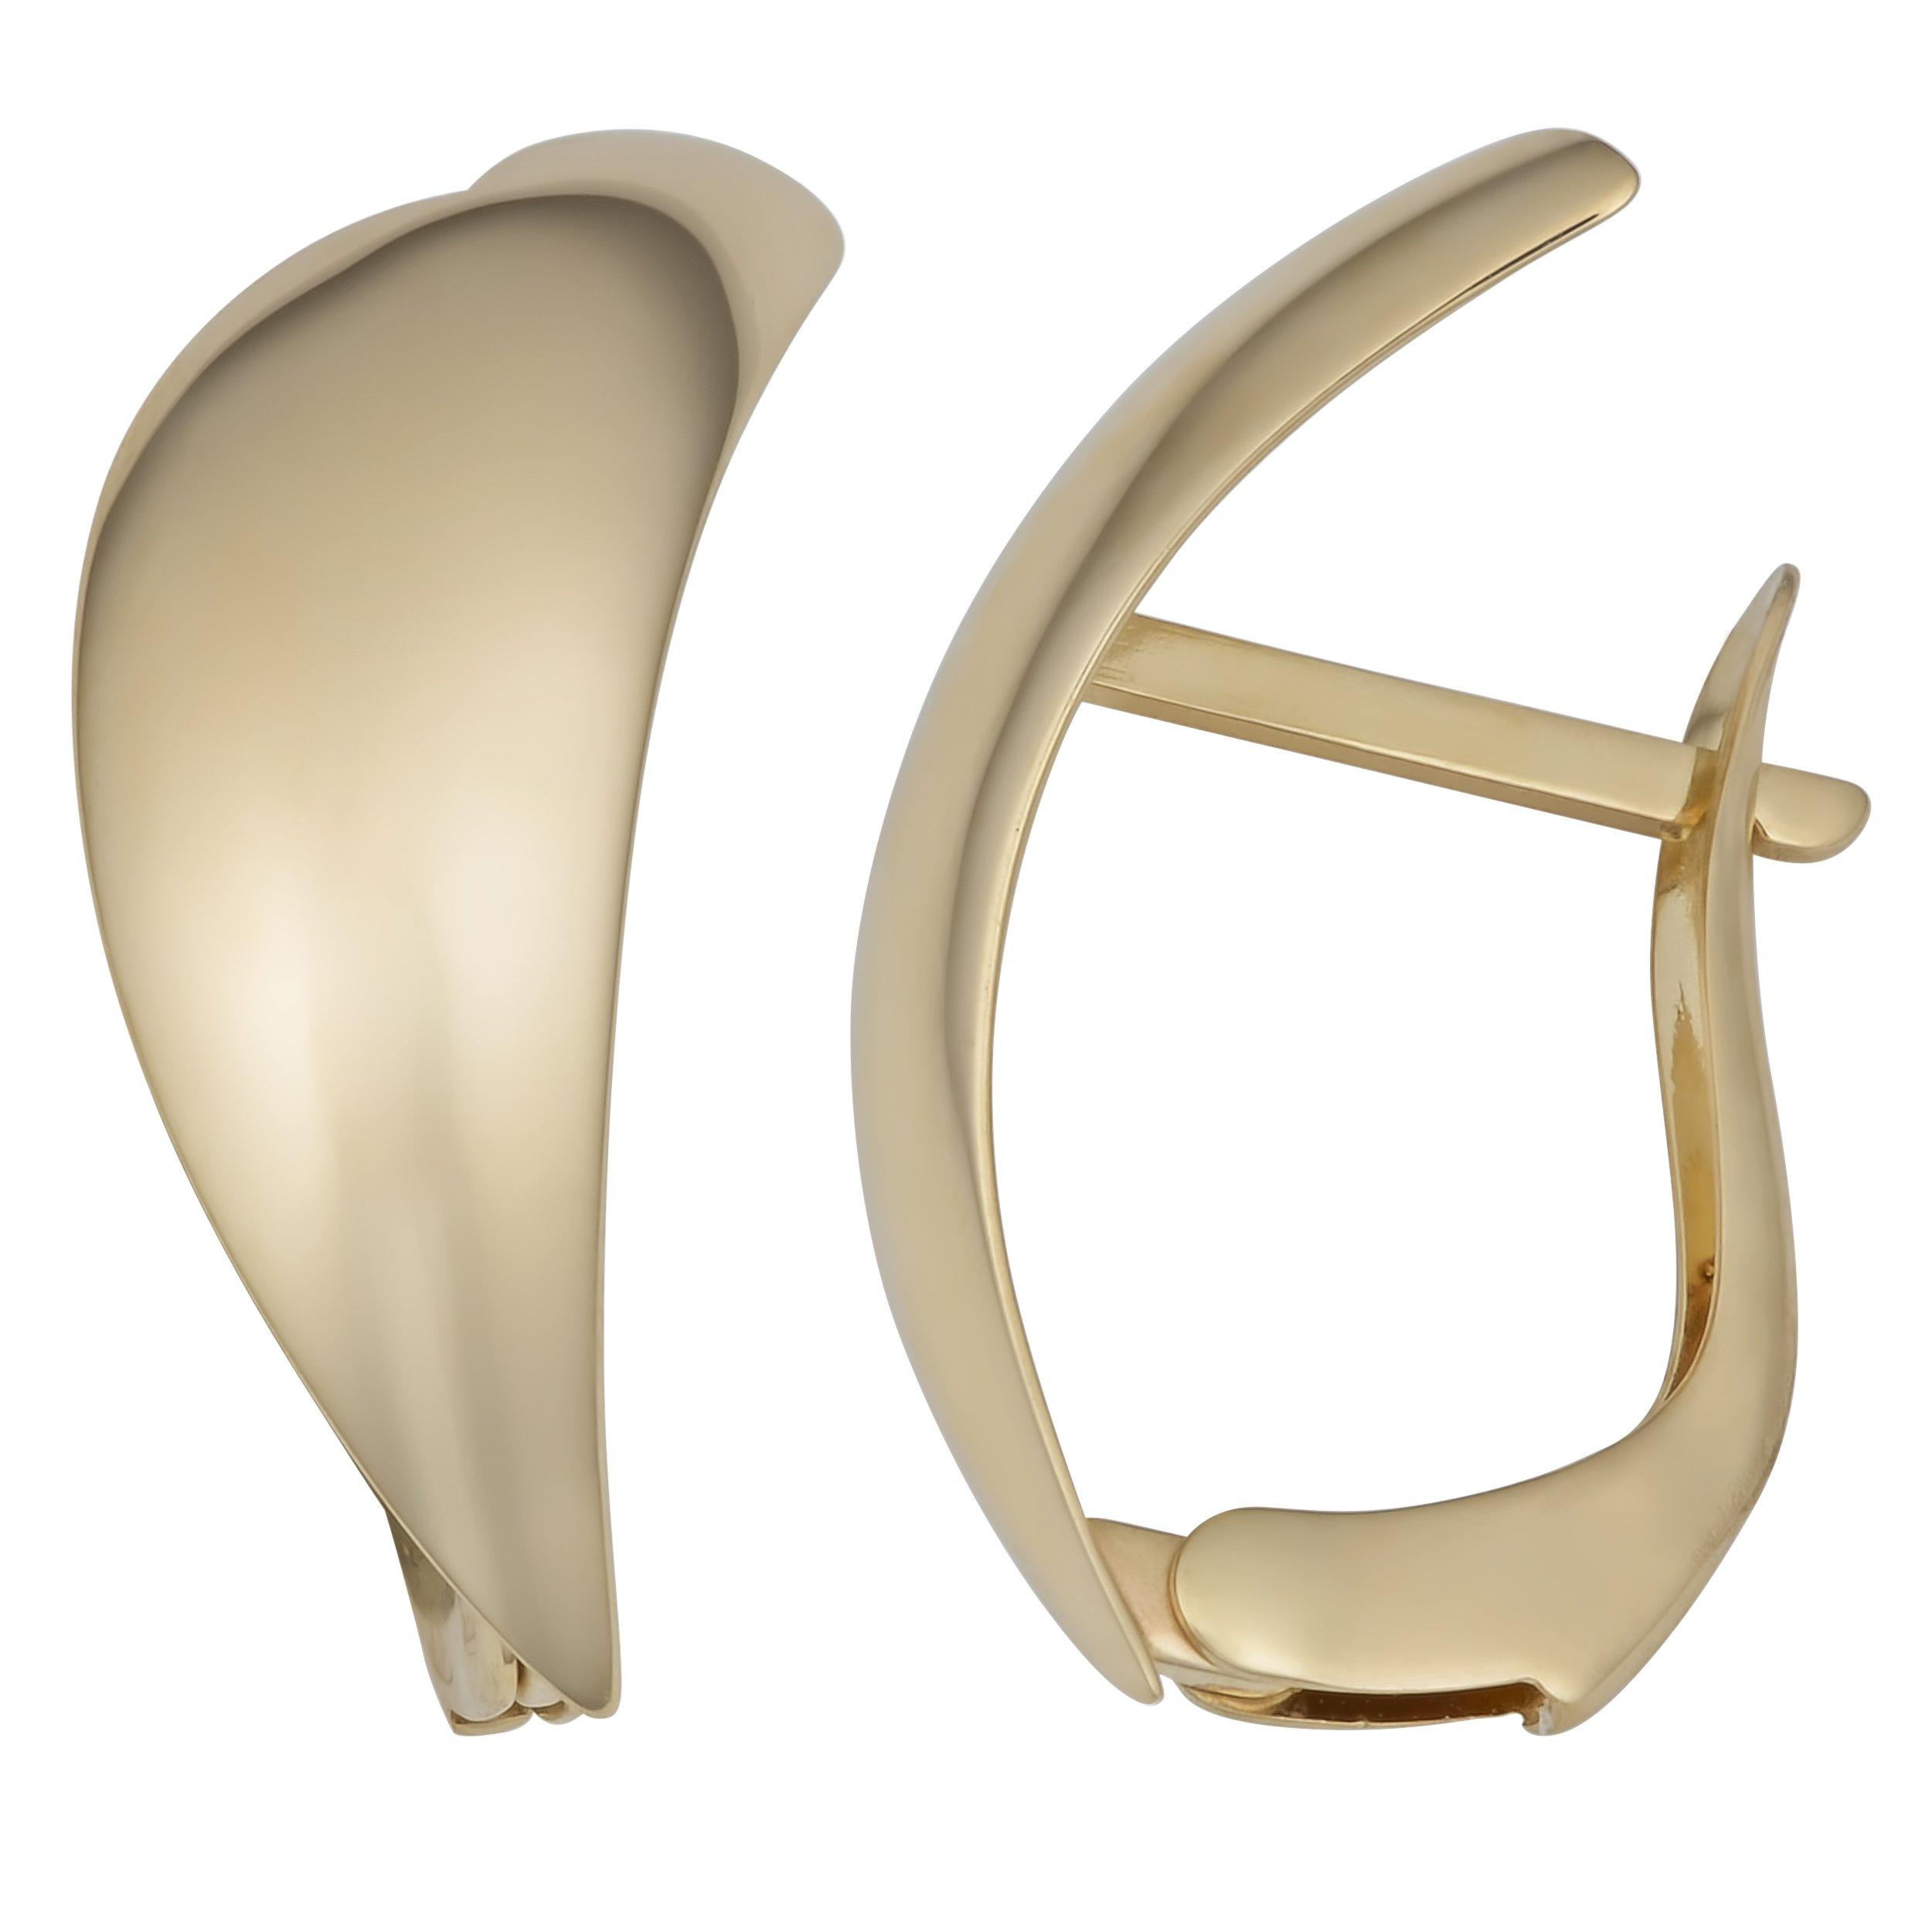 14k Yellow Gold Stylish Omega Back Earrings by Kooljewelry